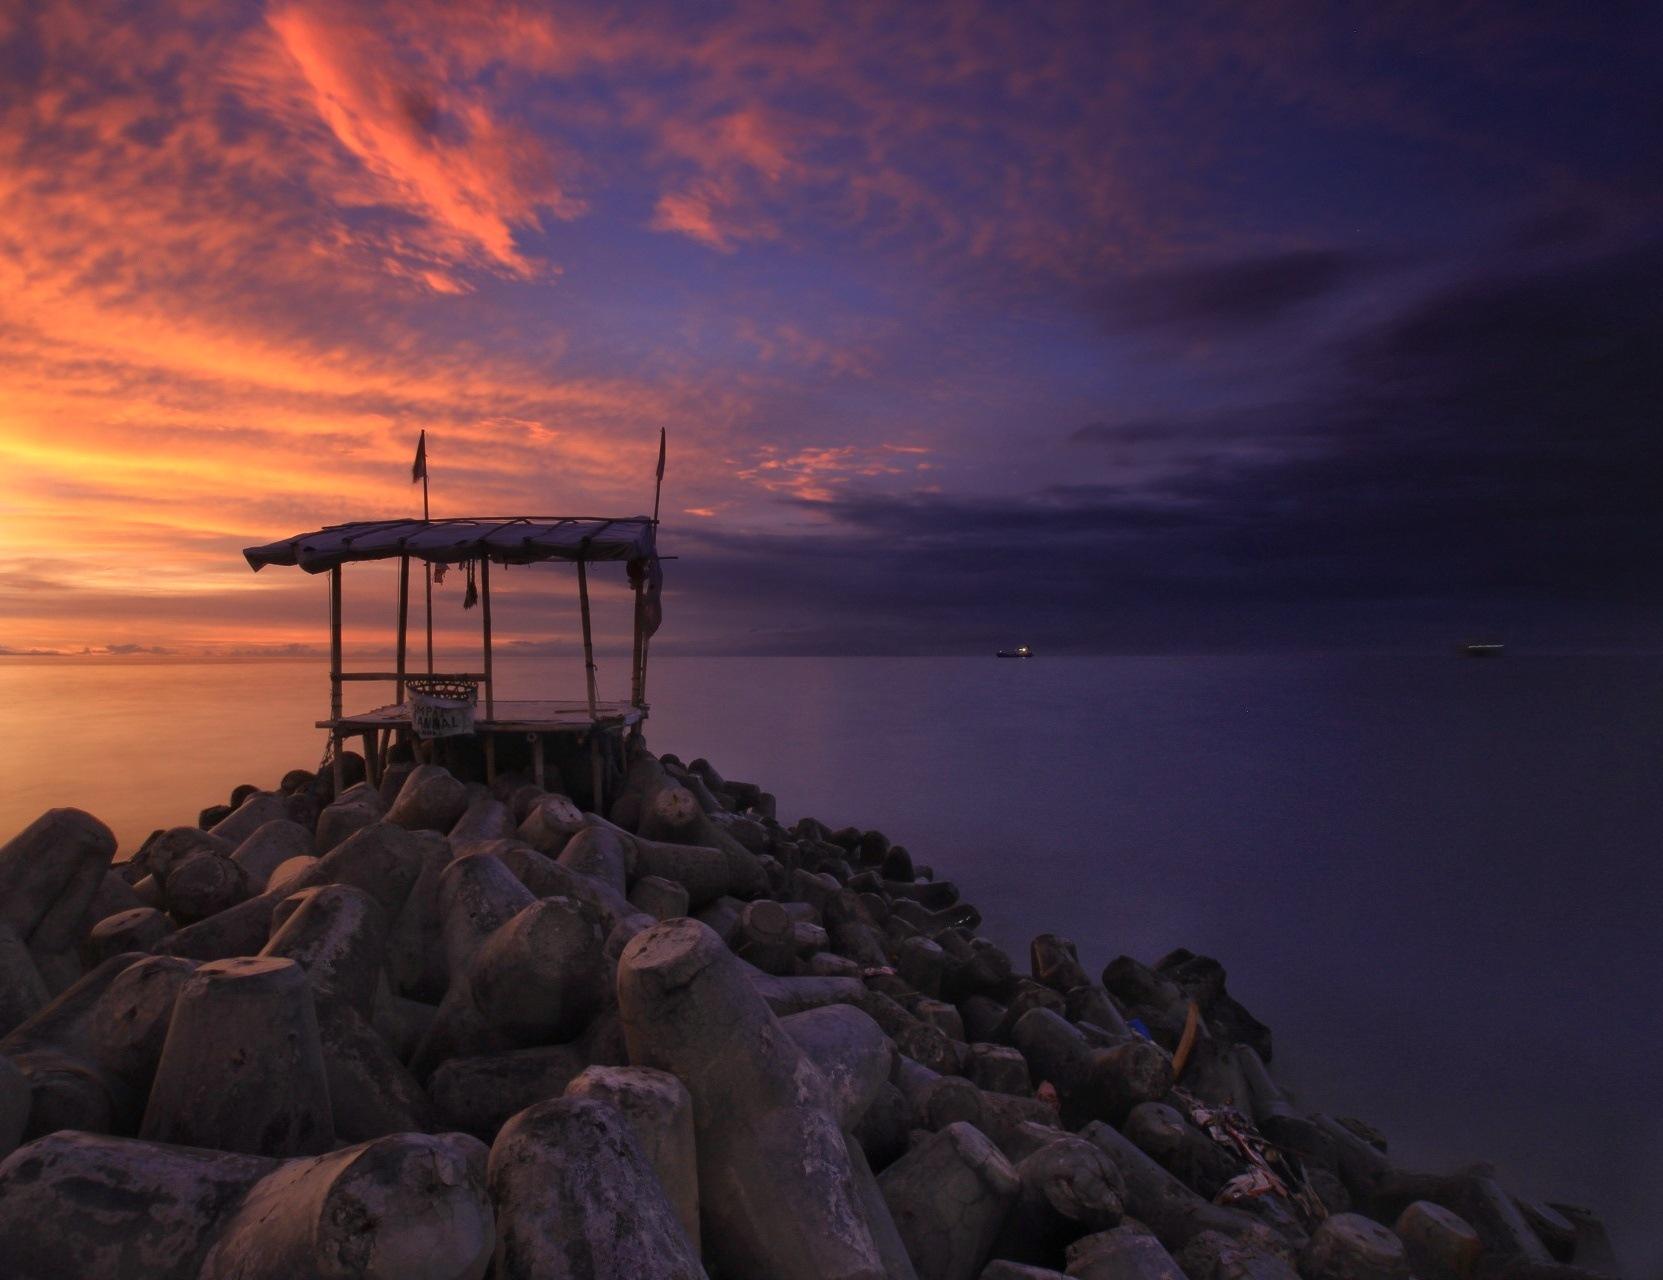 twilight by Rizal Febriano